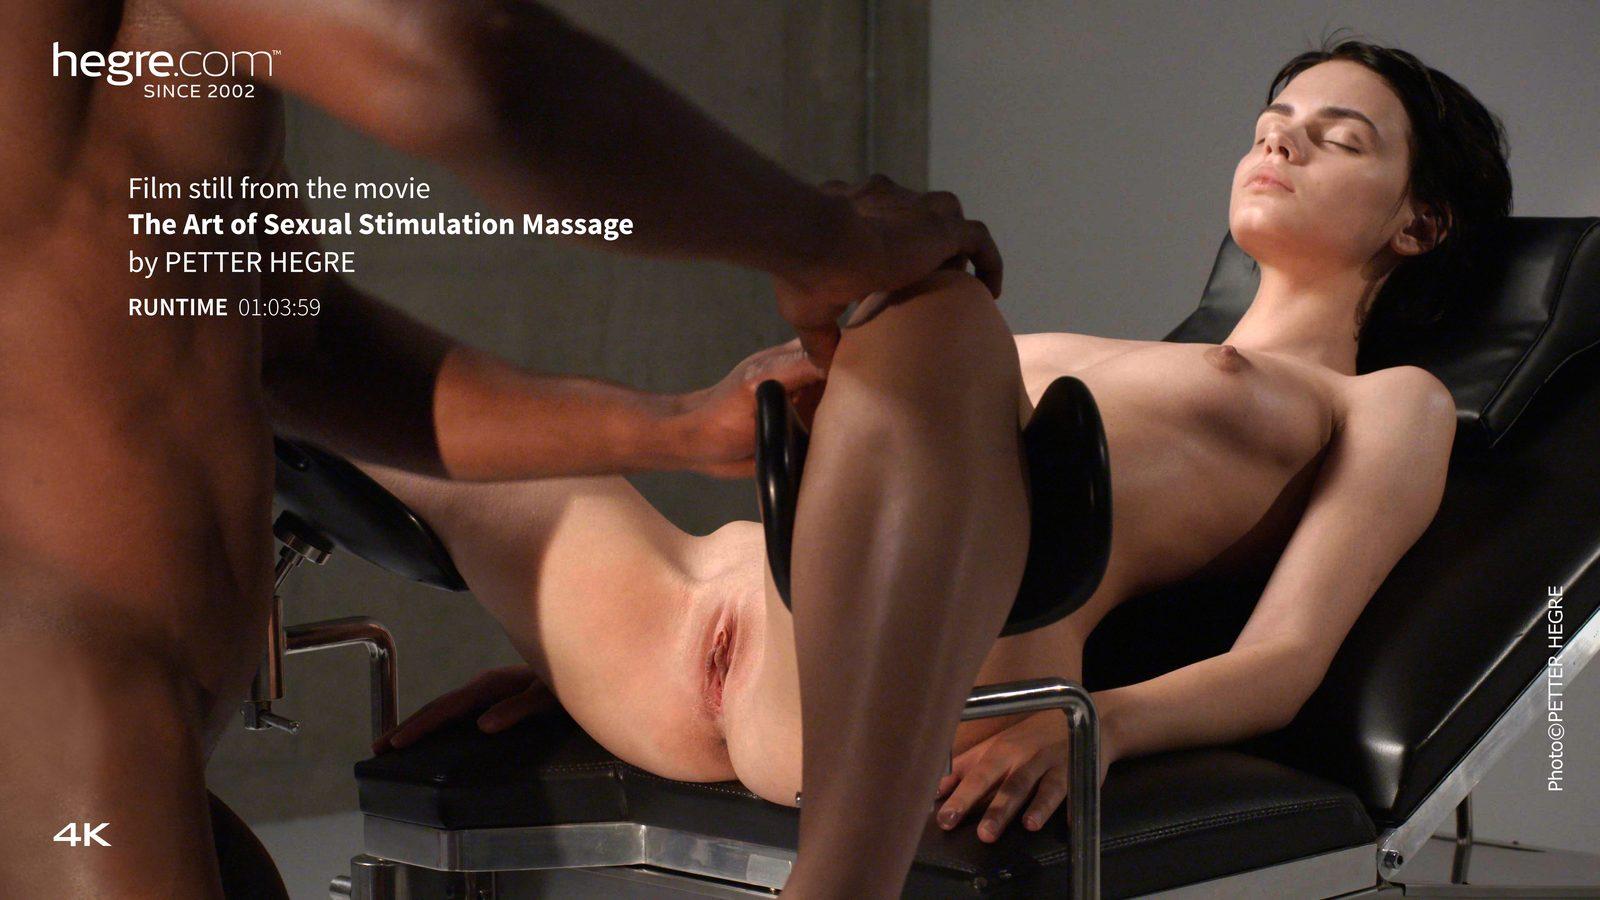 UNCENSORED Hegre-Art 2017-06-20 The Art of Sexual Stimulation Massage 1080P, AV uncensored